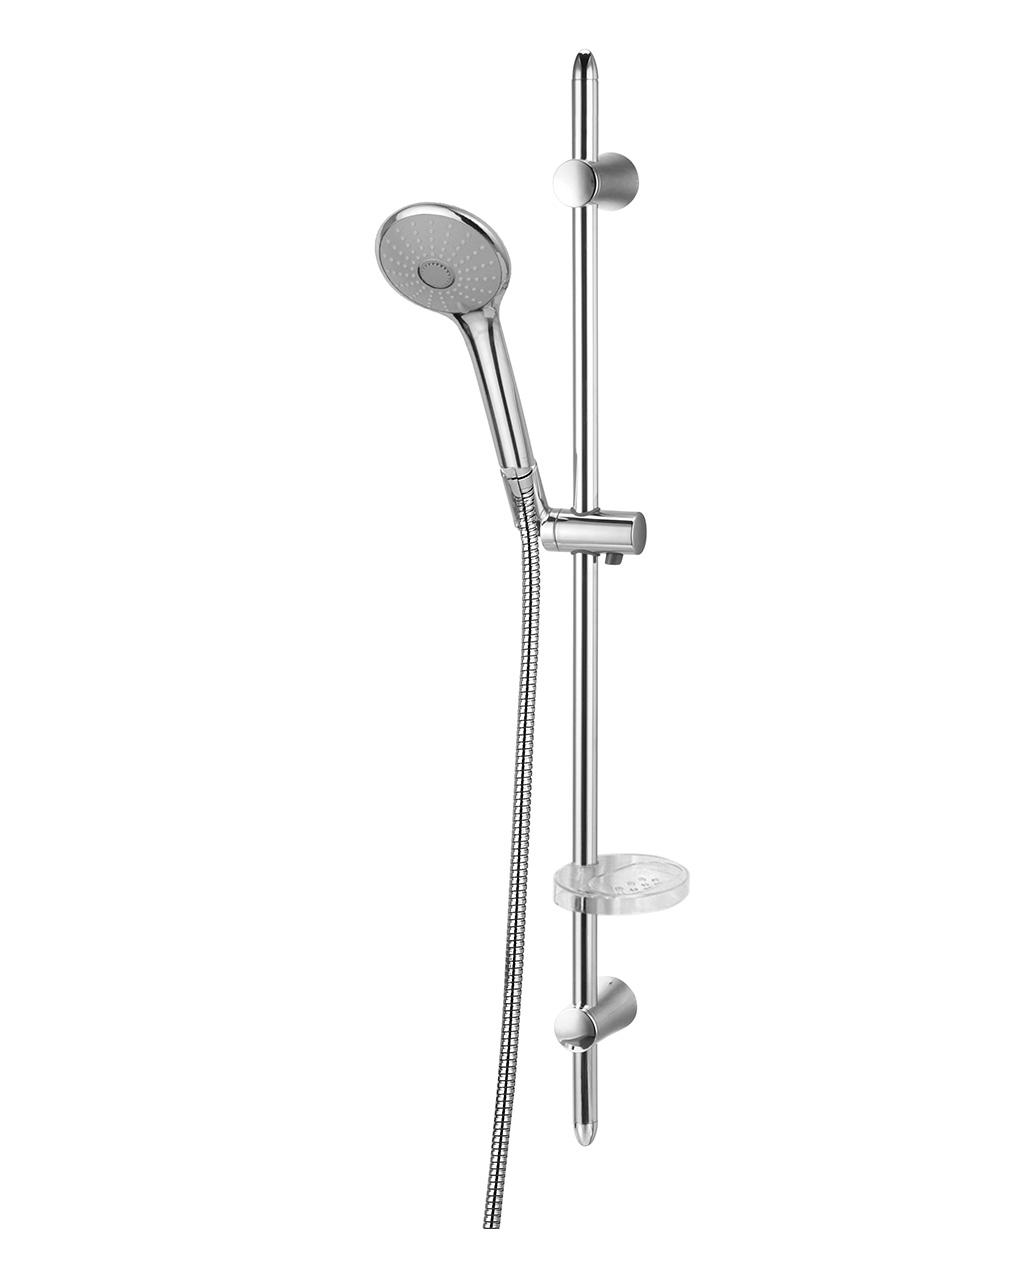 Душевая штанга IMPRESE VACLAV  L-72см,мыльница,ручной душ 3 режима,шланг 1,5м с вращающимся конусом (Anti-Twist),блист. 7212003